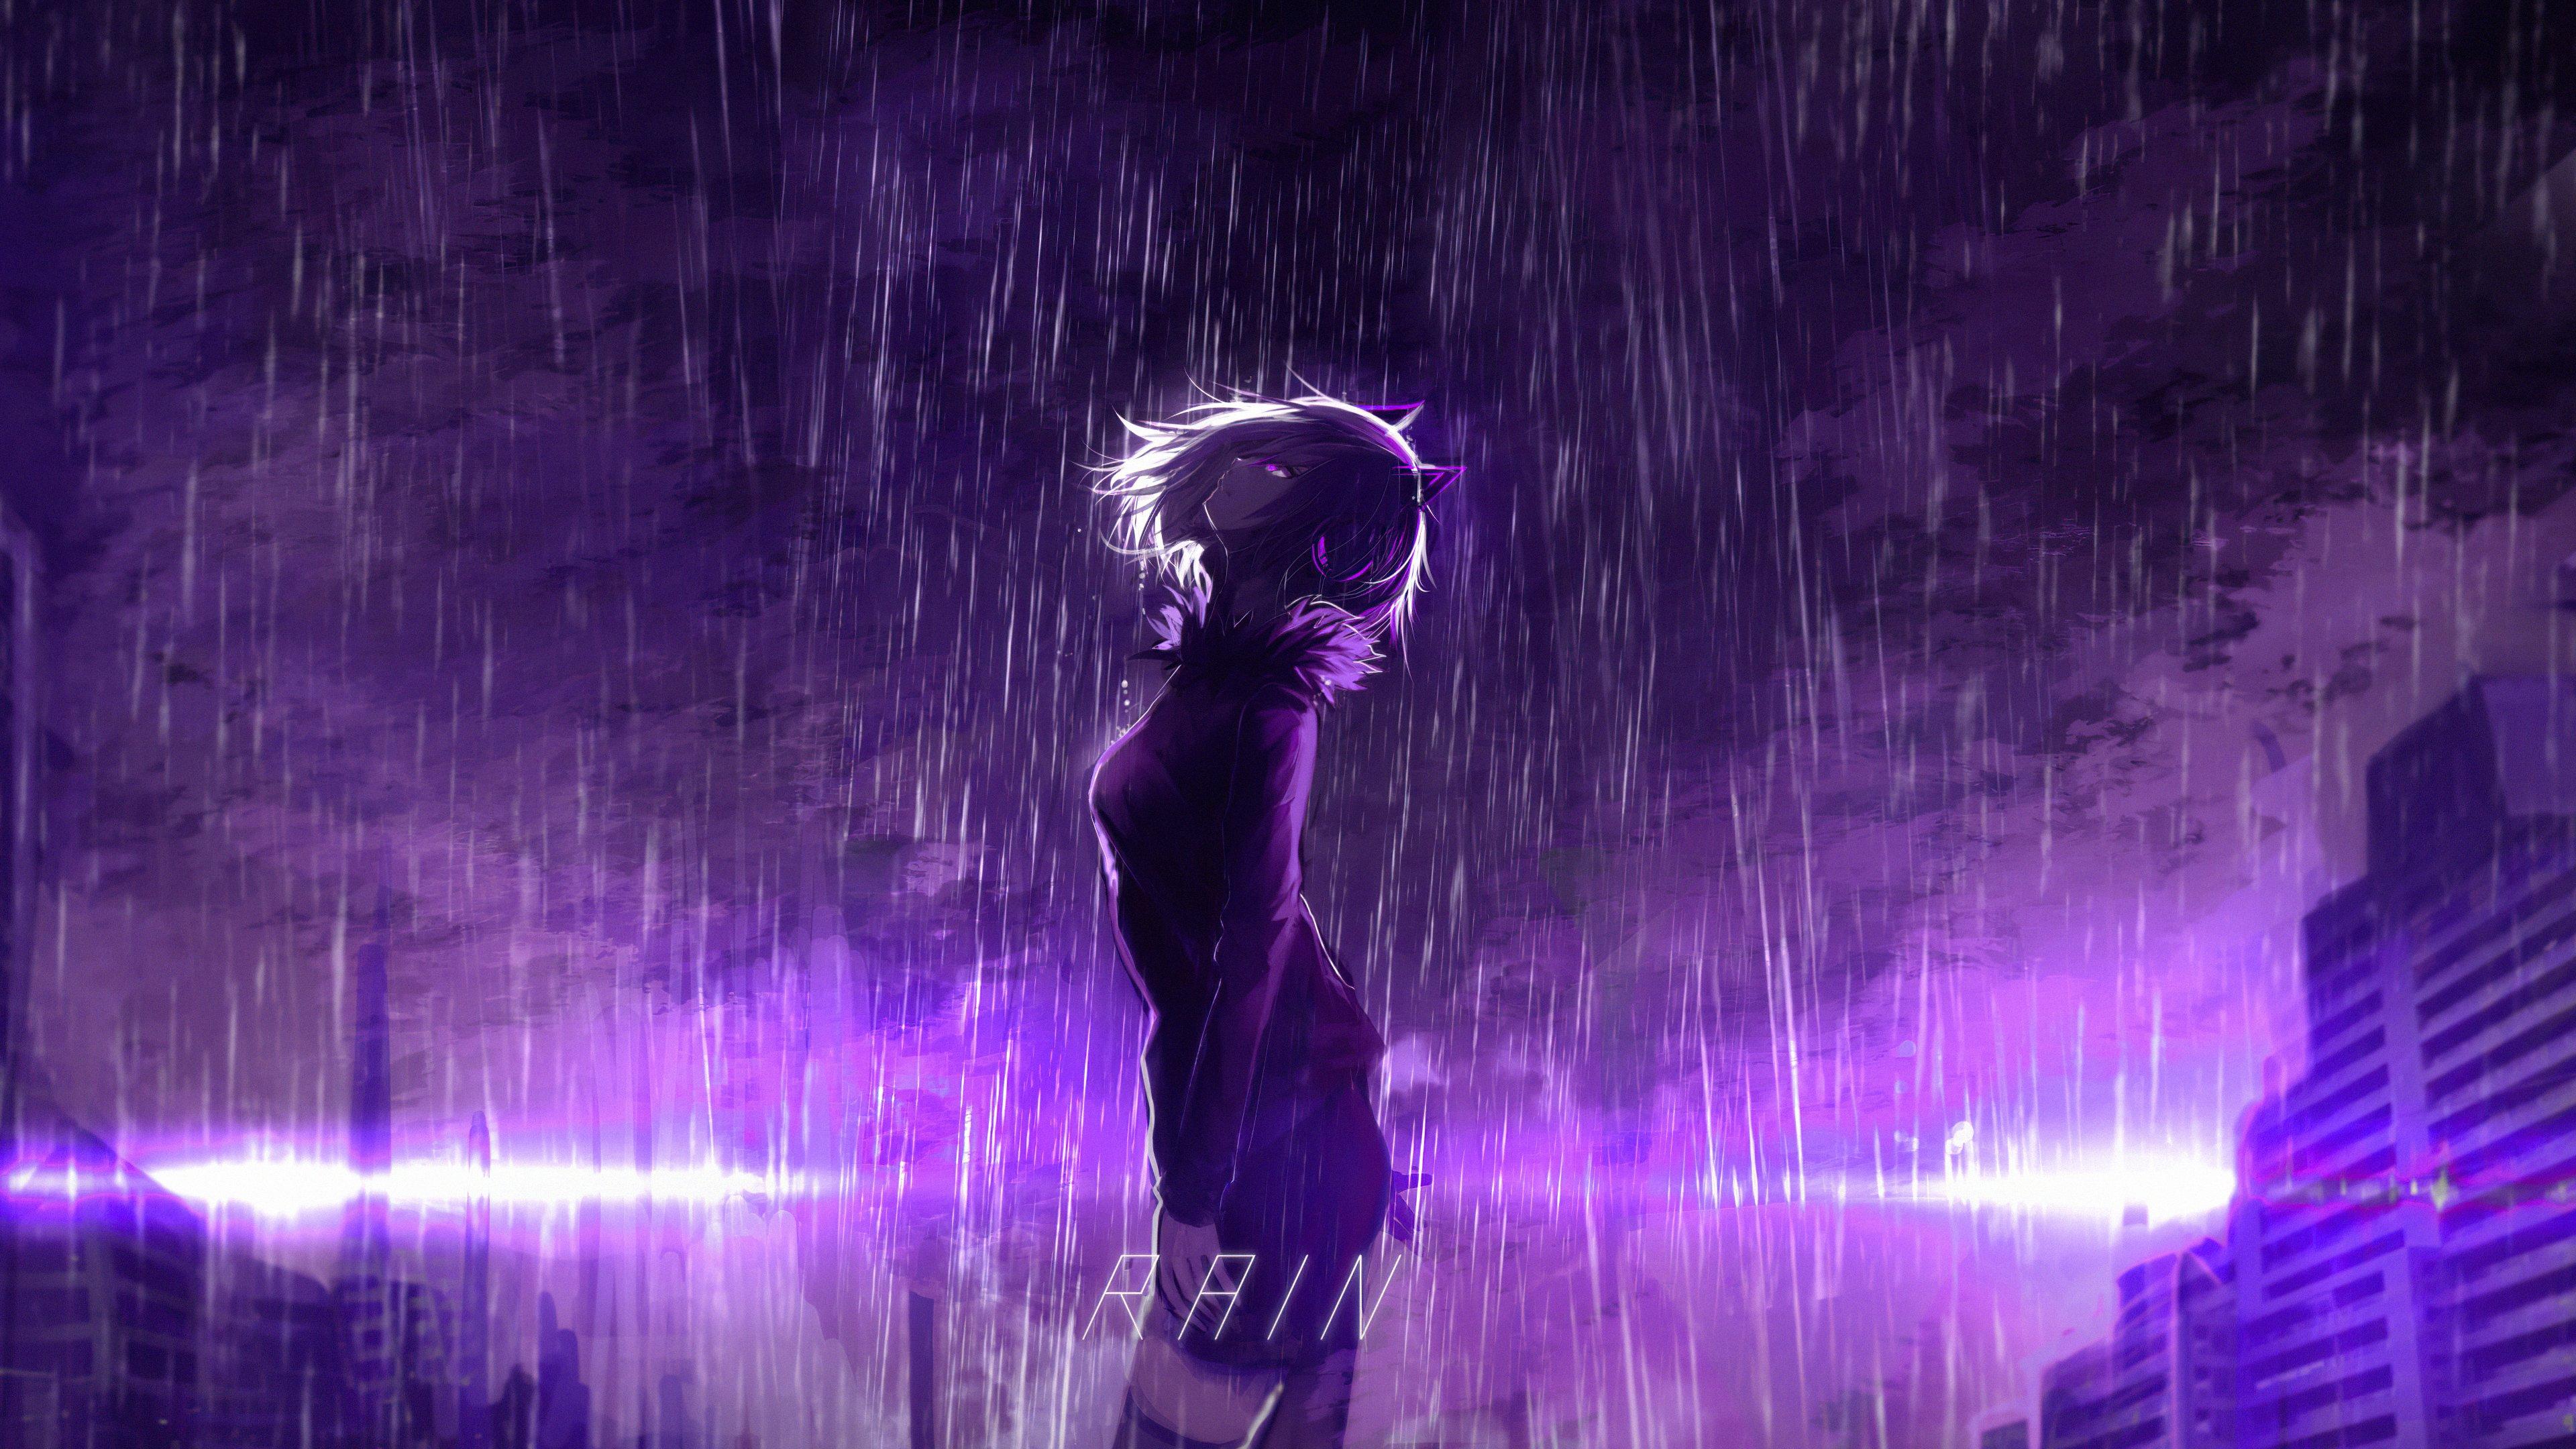 Fondos de pantalla Chica bajo lluvia morada